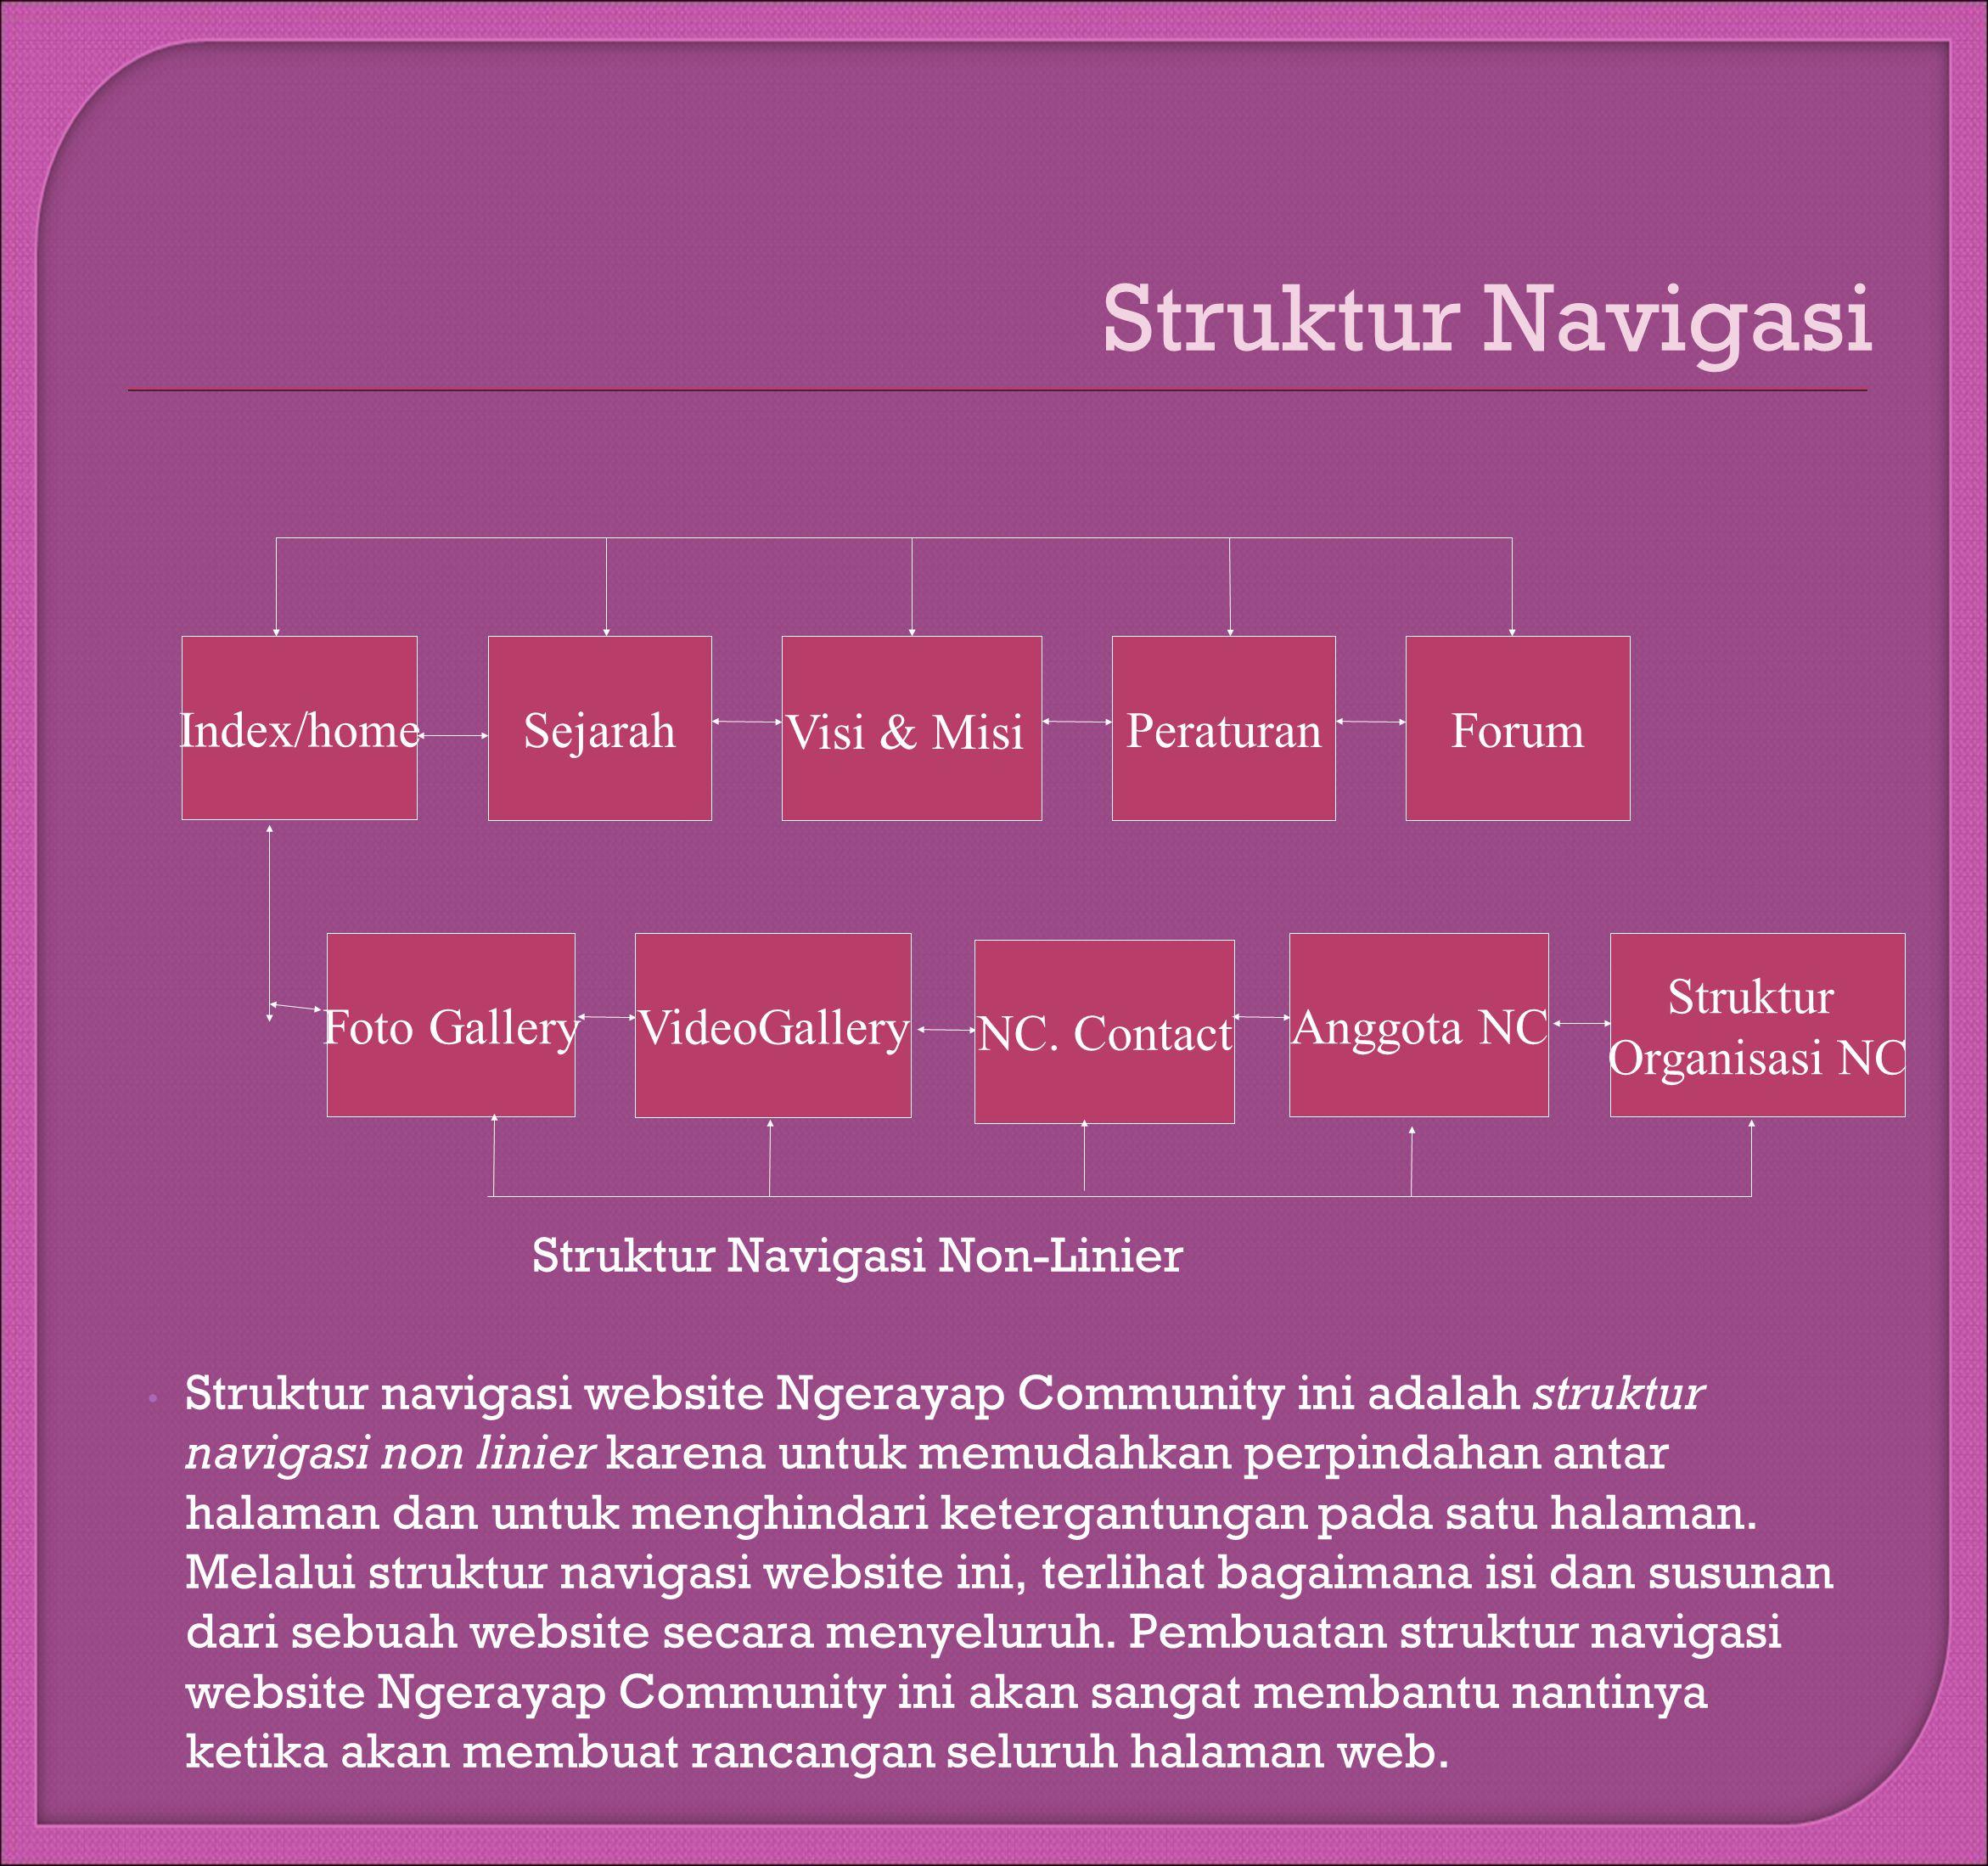 Struktur Navigasi Index/home Sejarah Visi & Misi PeraturanForum Foto Gallery VideoGallery NC.